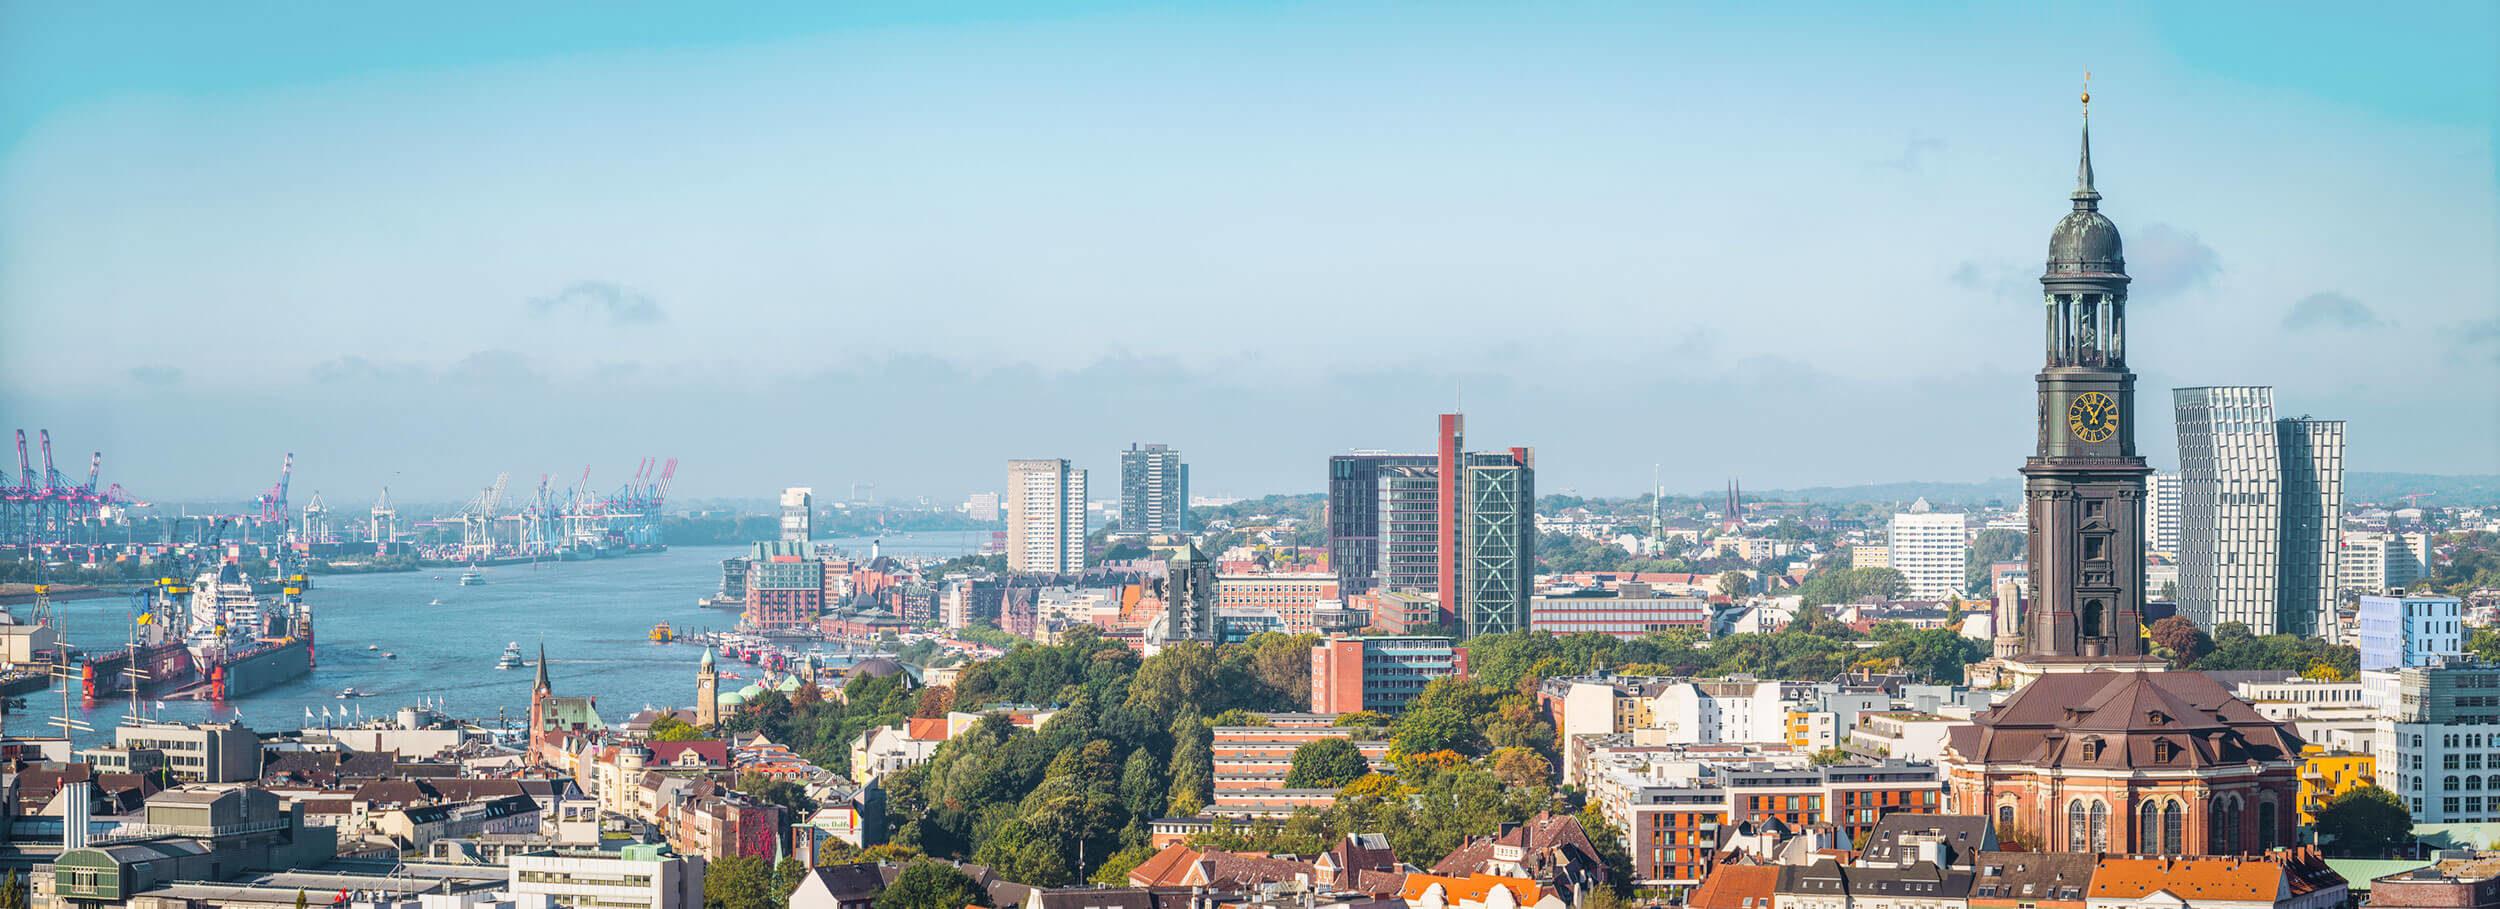 Hamburg Skyline, Foto: fotoVoyager, istockphoto.com